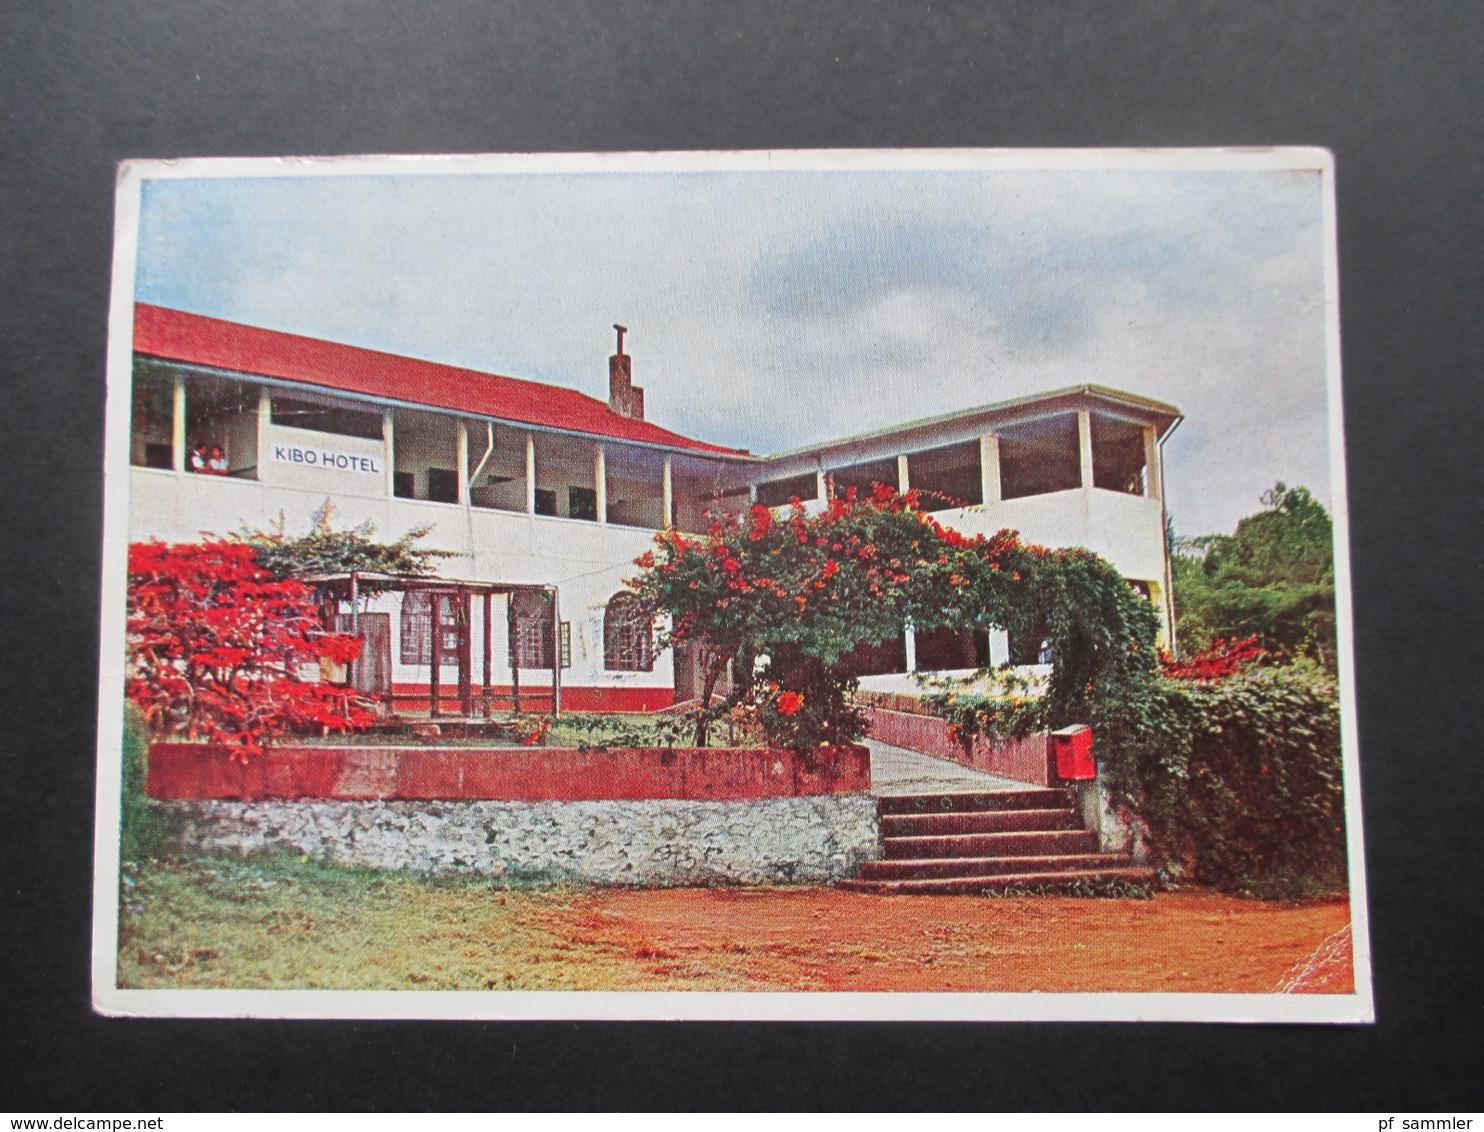 AK 1960 Kibo Hotel Kilimanjaro Marangu Moshi. Kenya Uganda Tanganyika. East Africa - Hotels & Gaststätten